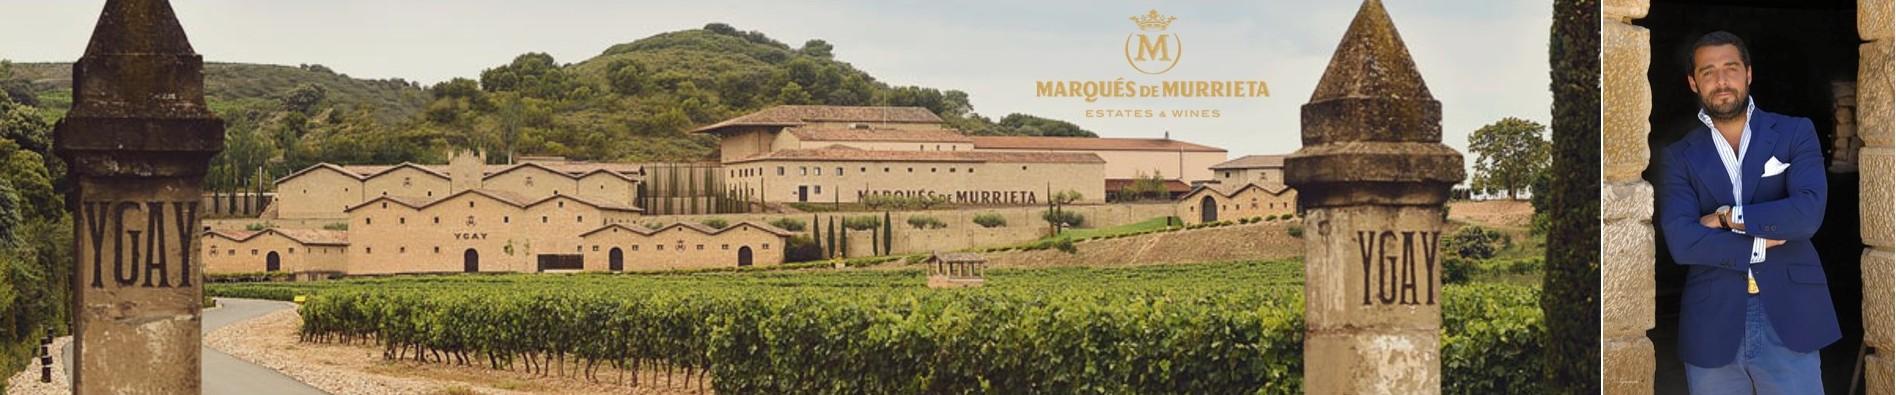 Marqu-s-de-Murrieta2